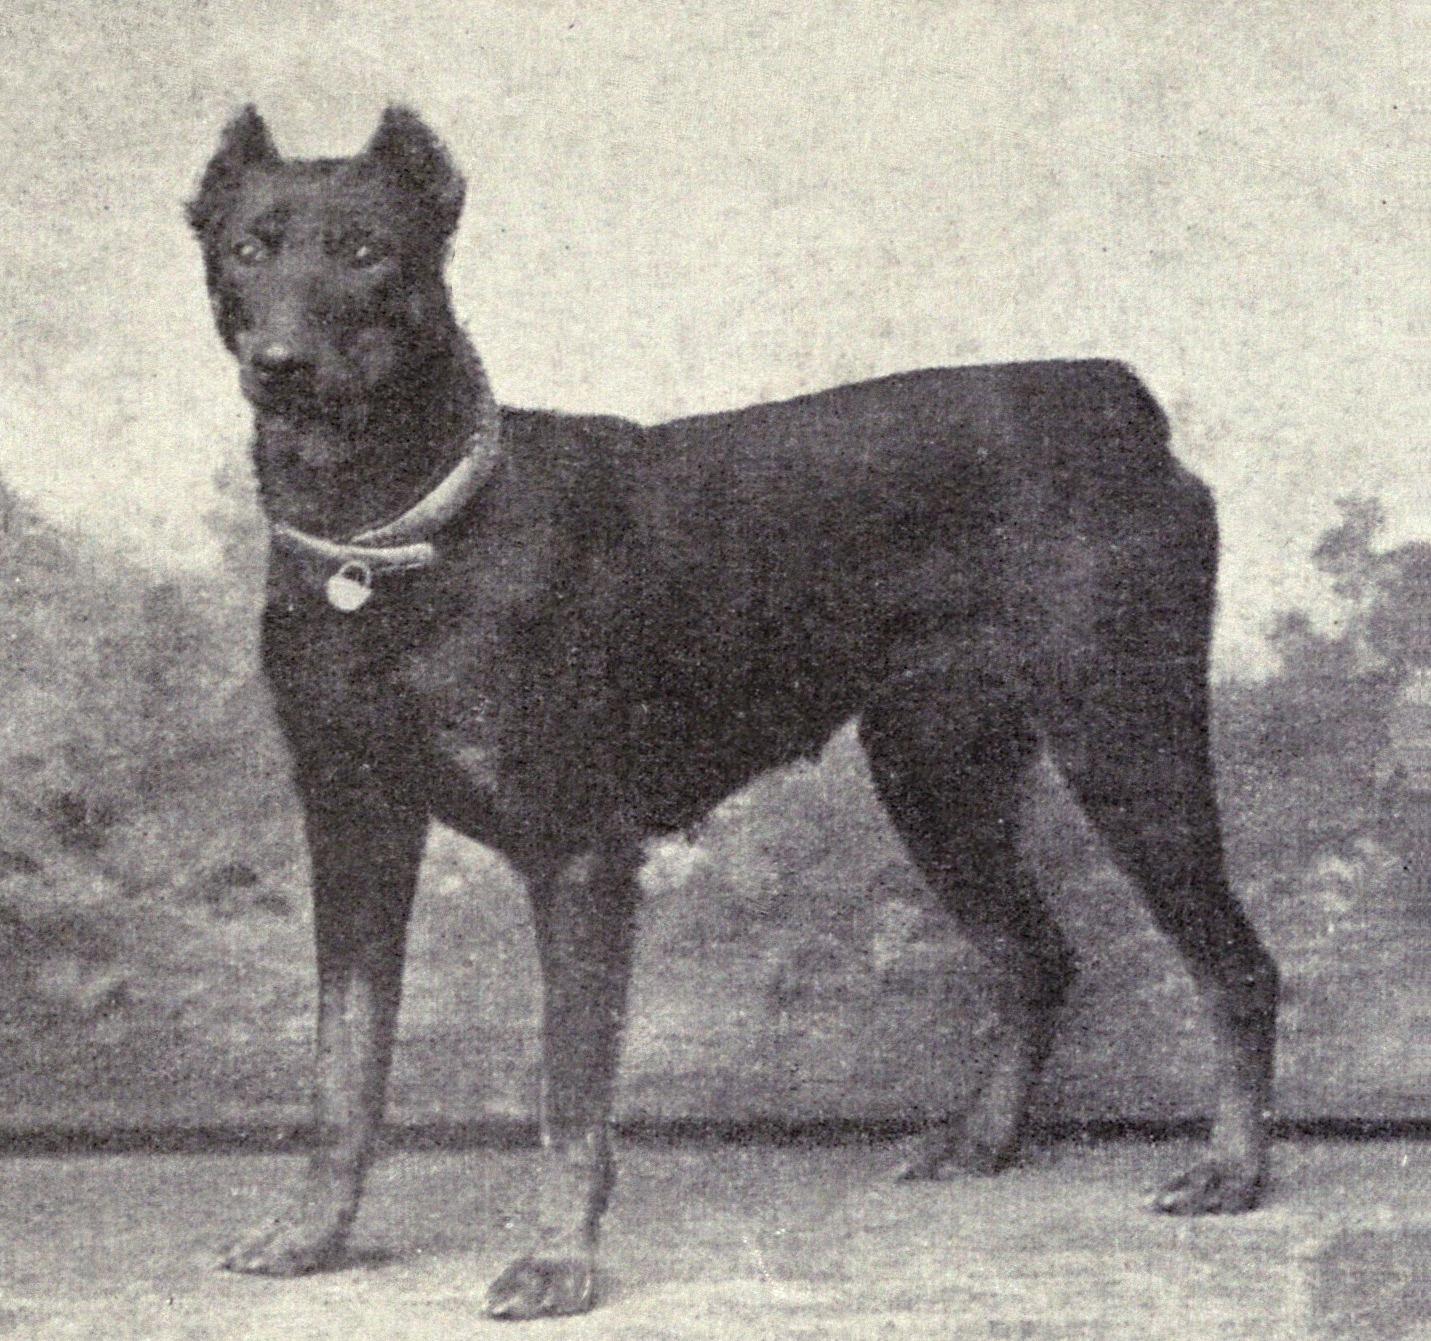 Dog Bite Citation In Georgia